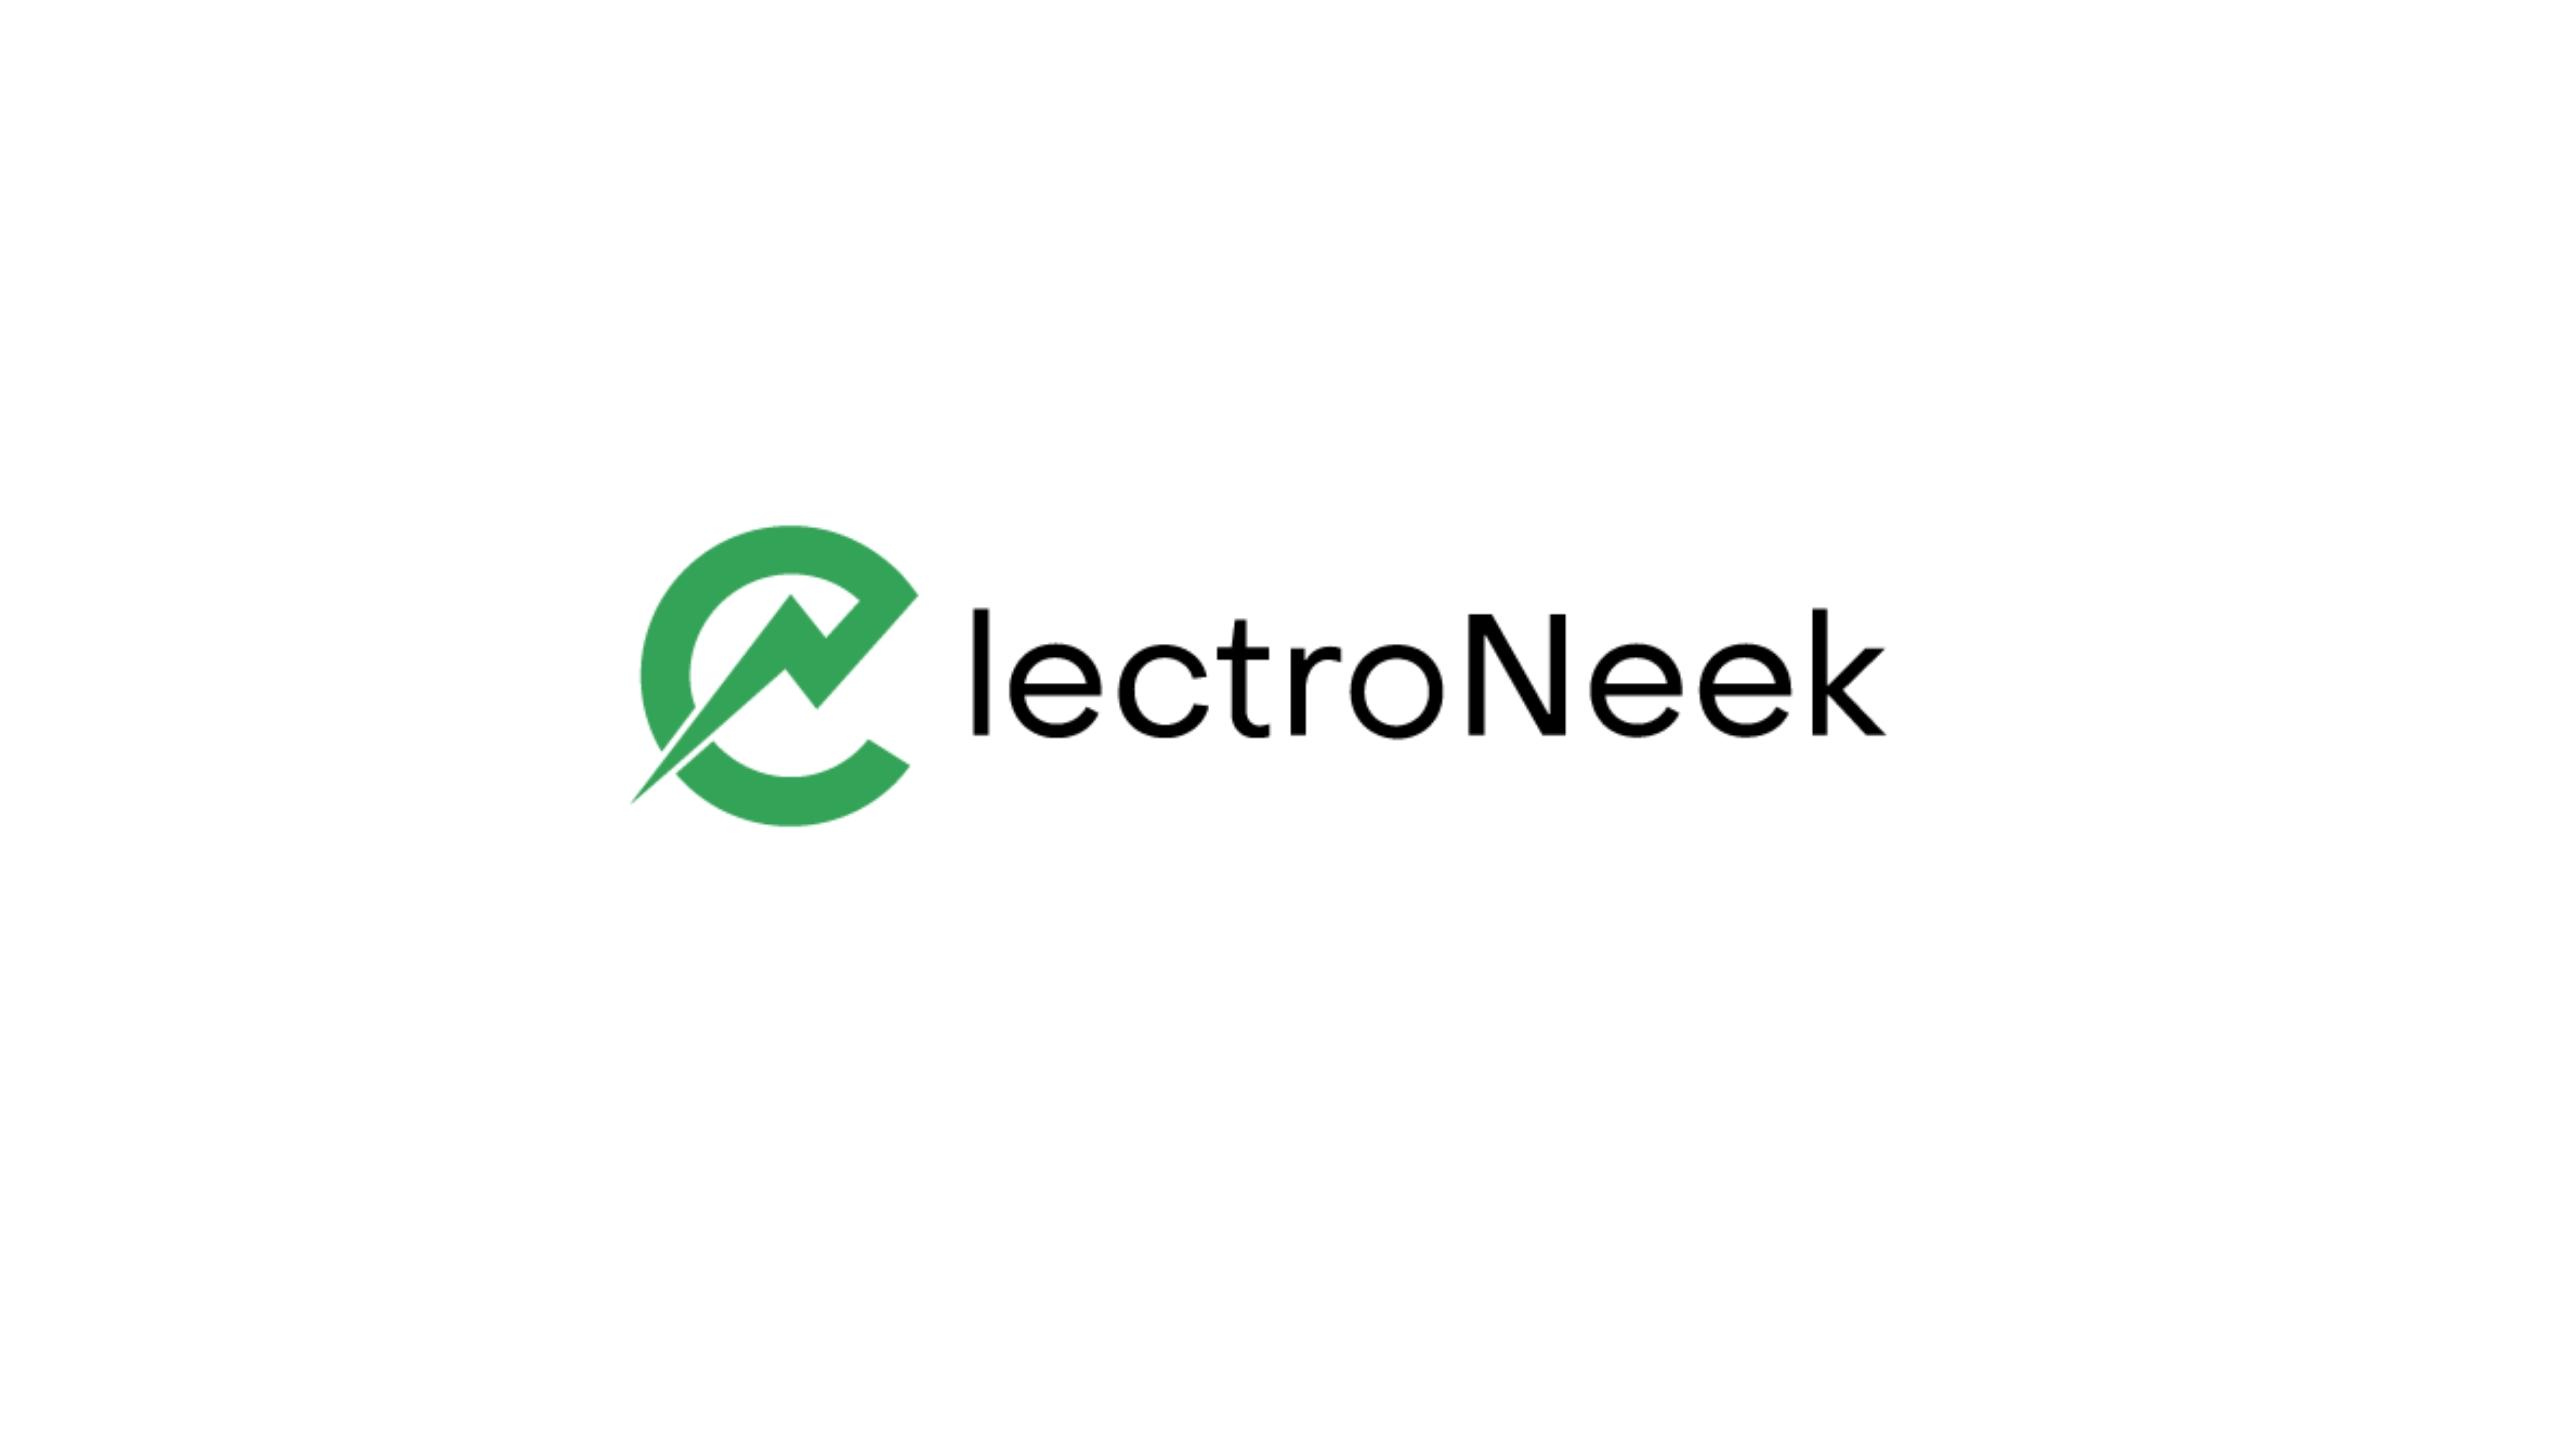 SAGE about ElectroNeek